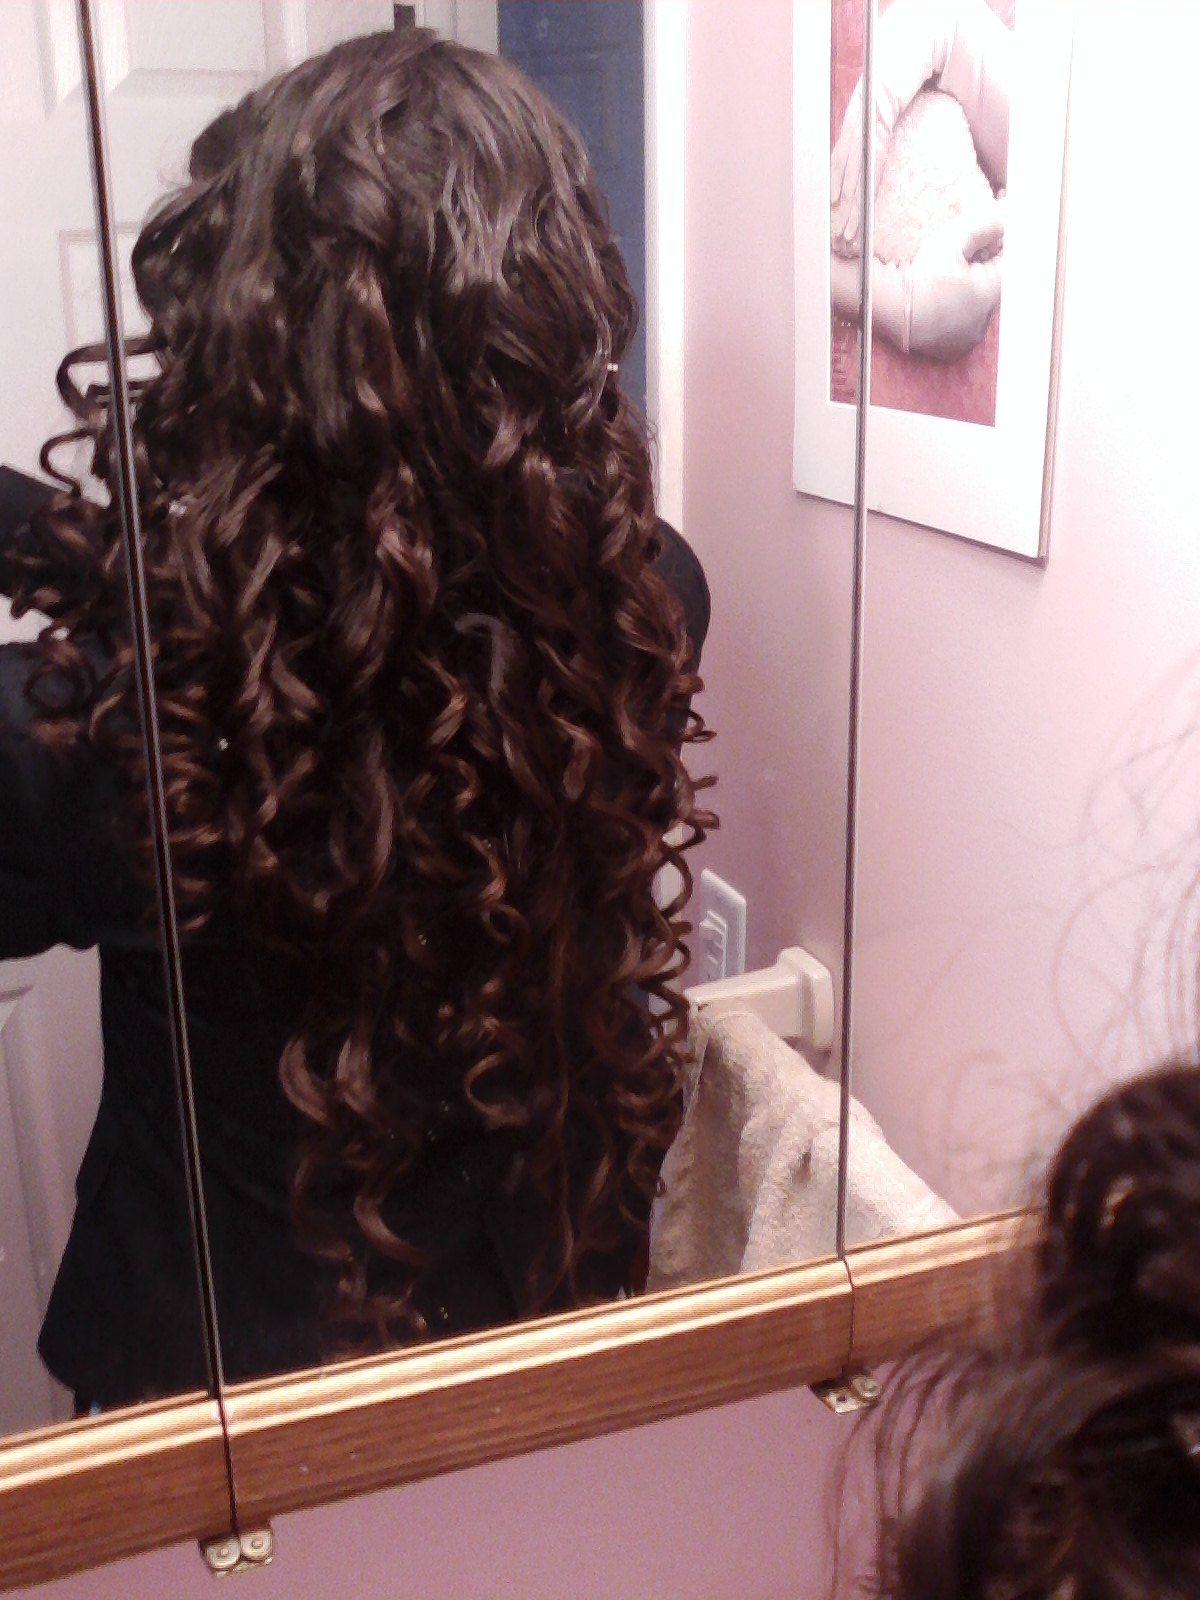 Ha Hair Accessories For Apostolic Long Hair - Apostolic hairstyles hair pinterest curls my hair and hair